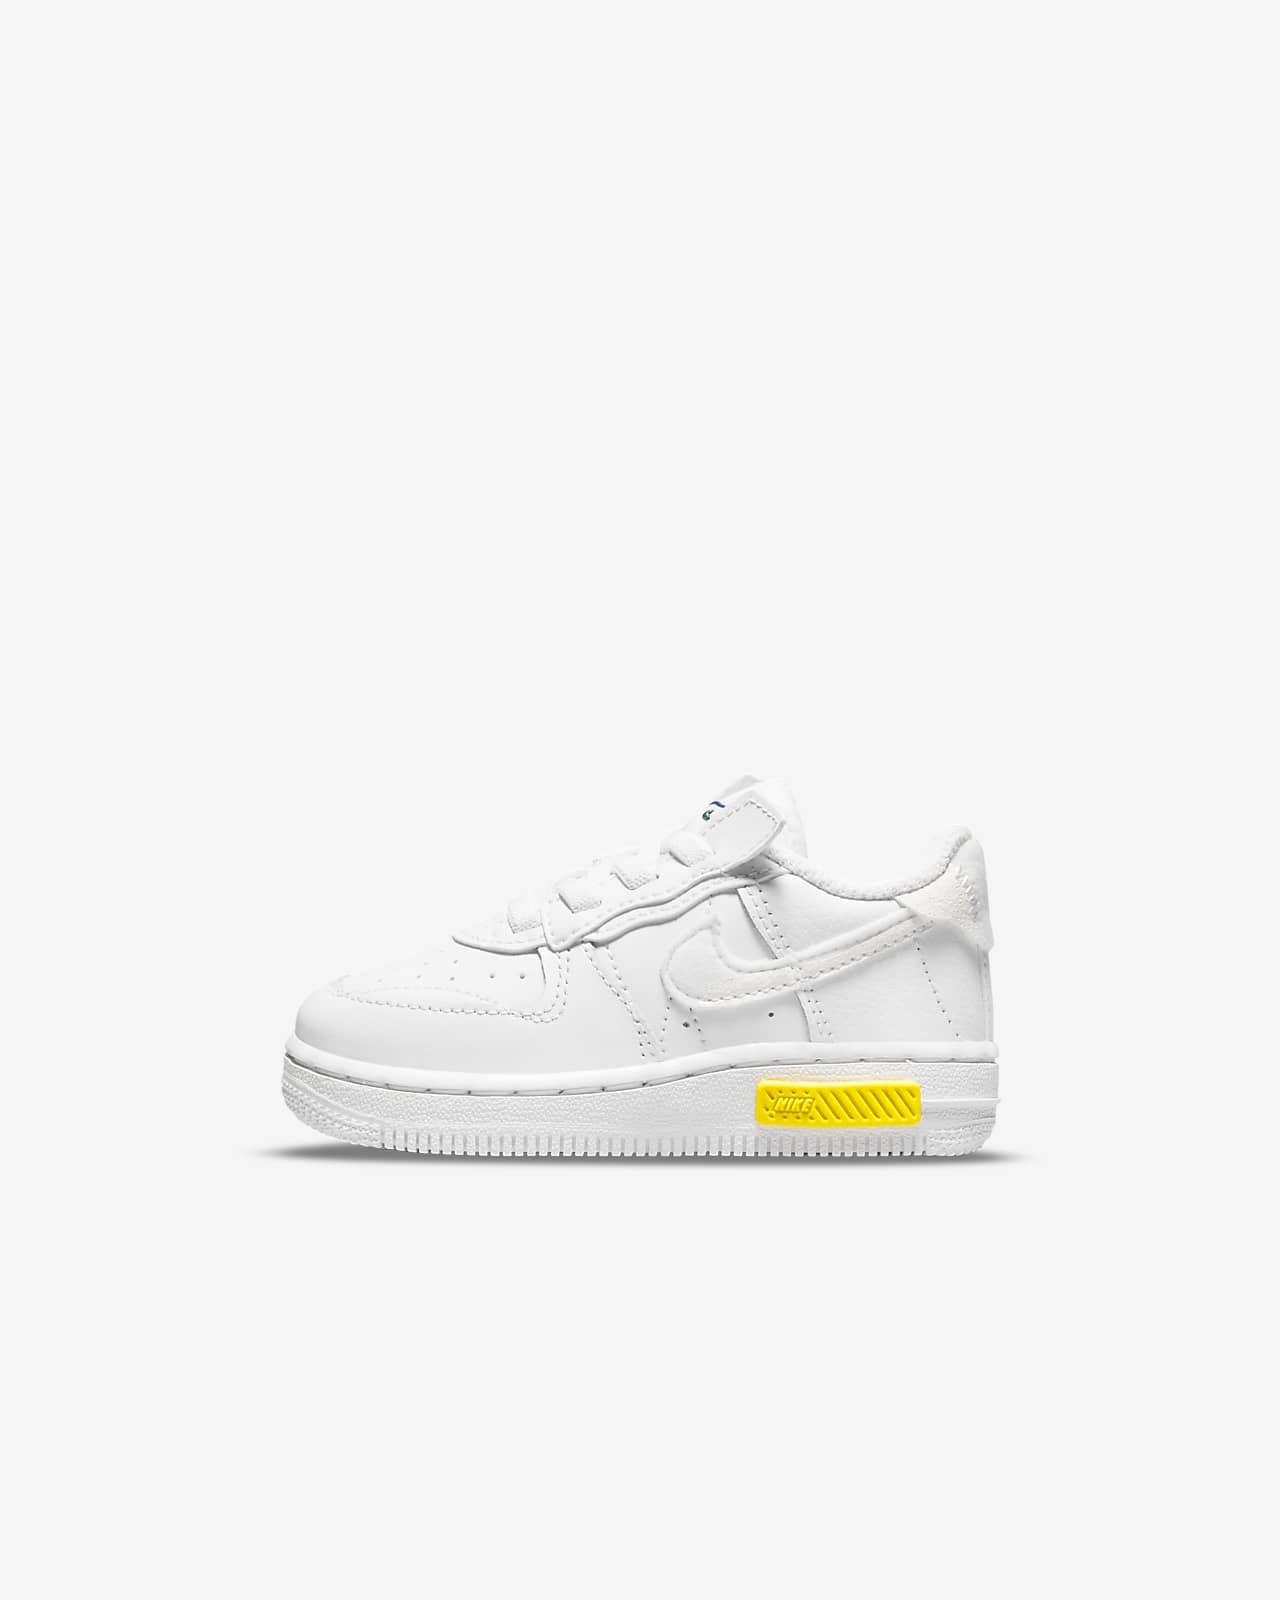 Nike Force 1 Fontanka 嬰幼兒鞋款